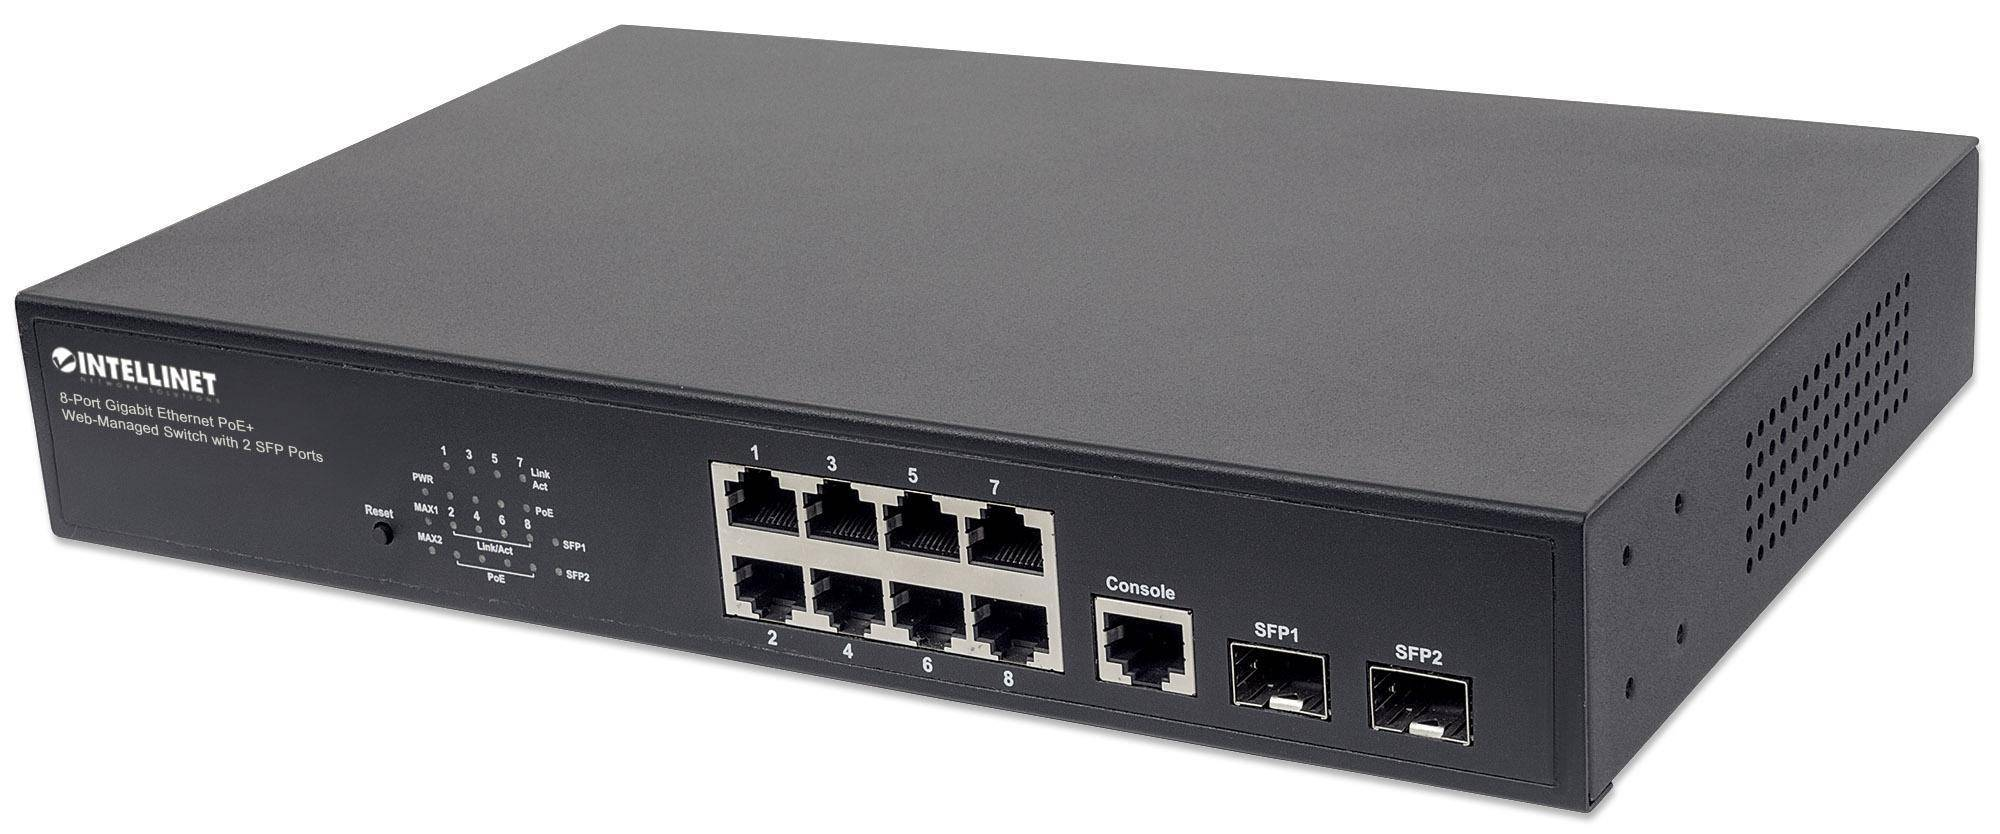 intellinet switch gigabit ethernet 8 porte poe+ web-managed con 2 porte sfp